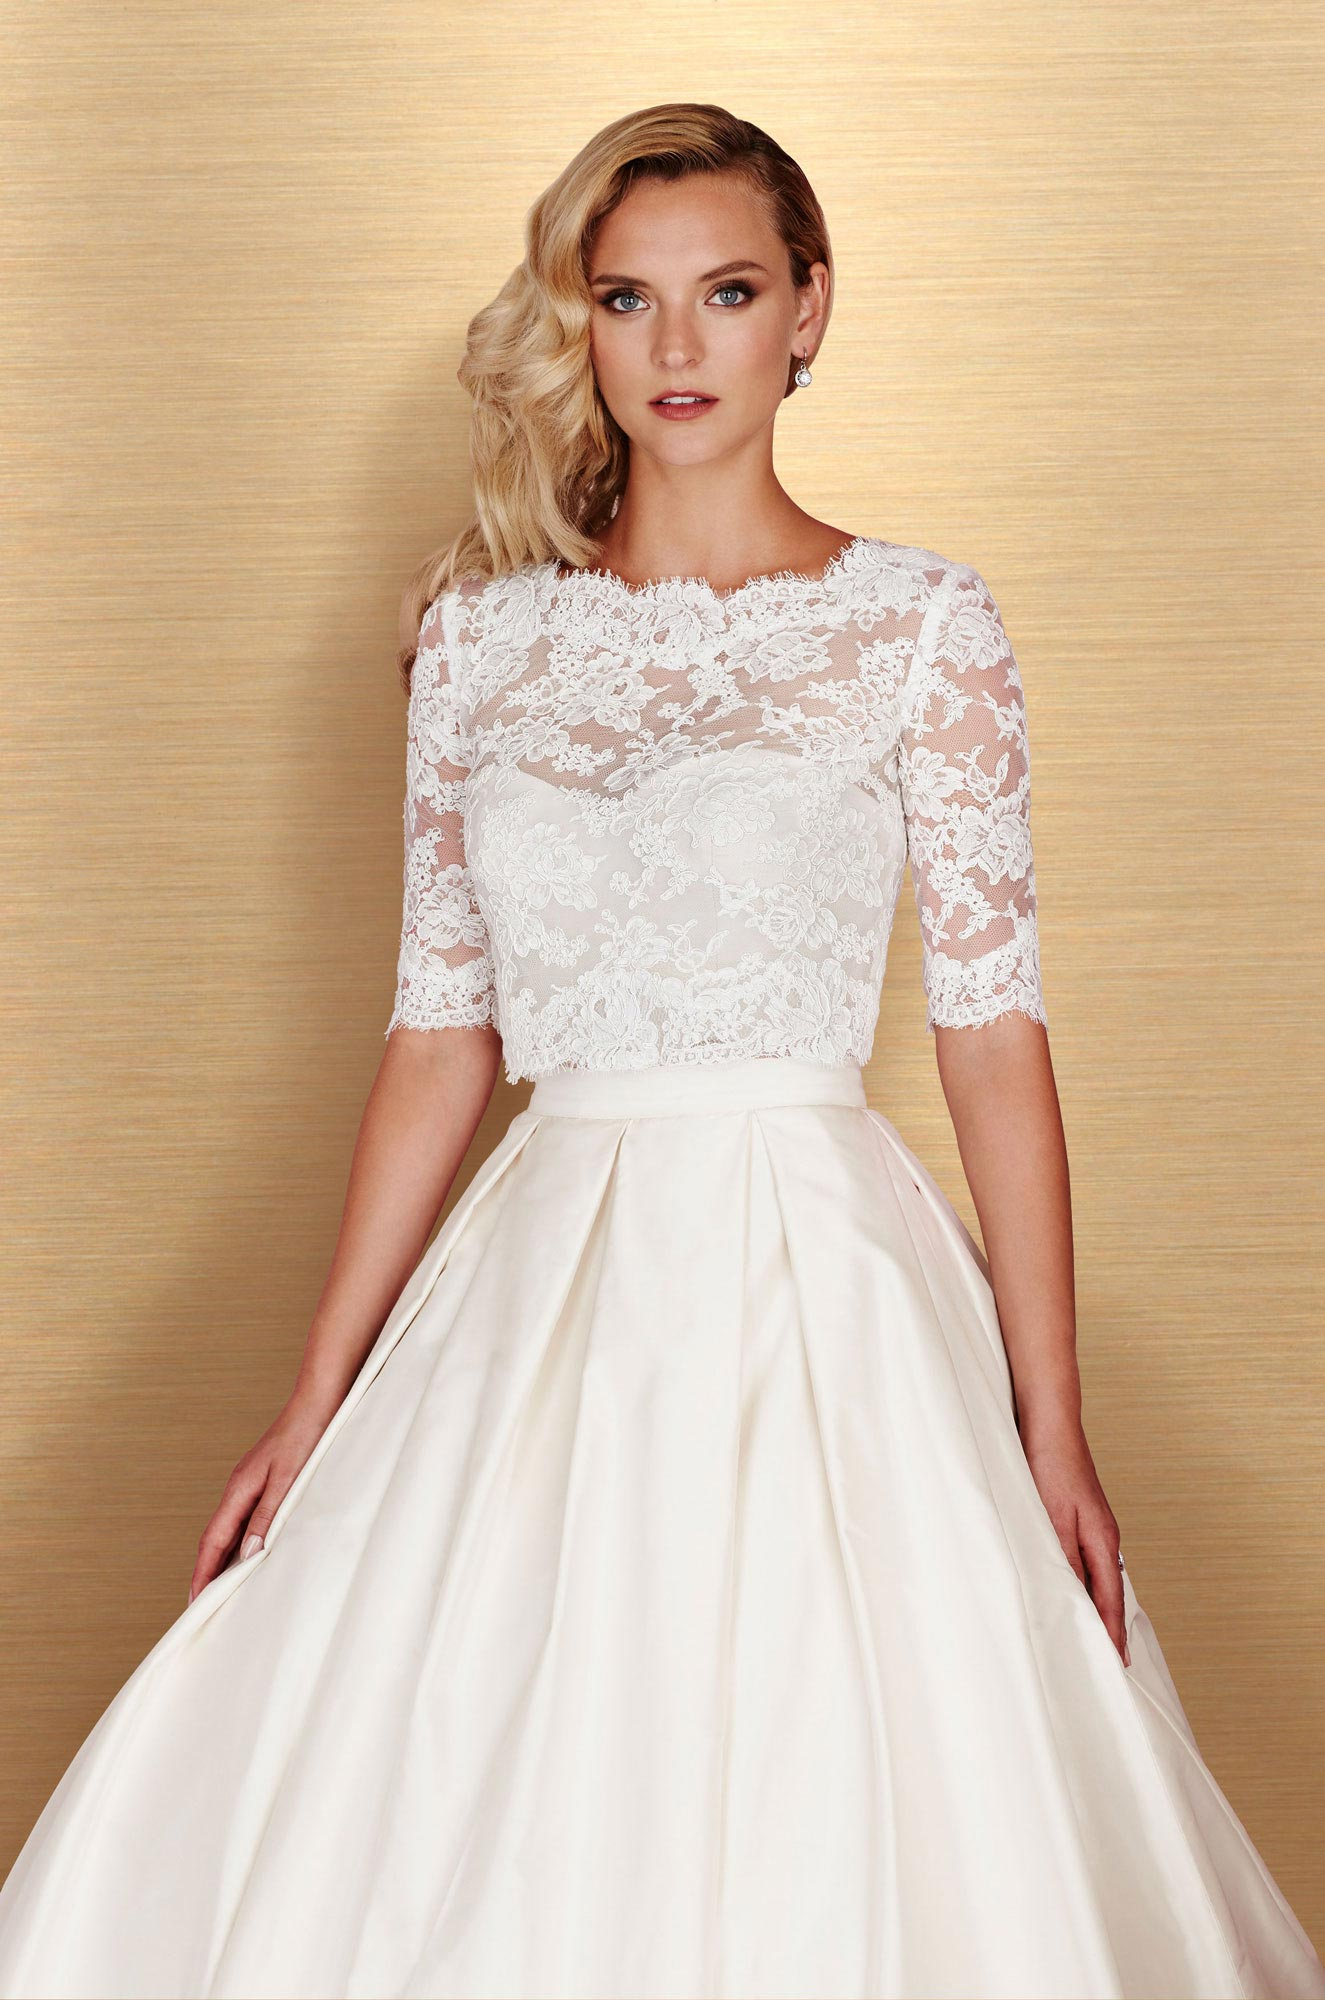 Paloma-Blanca-4667-3-Piece-Gown-Salon-Sample_6189C.jpg